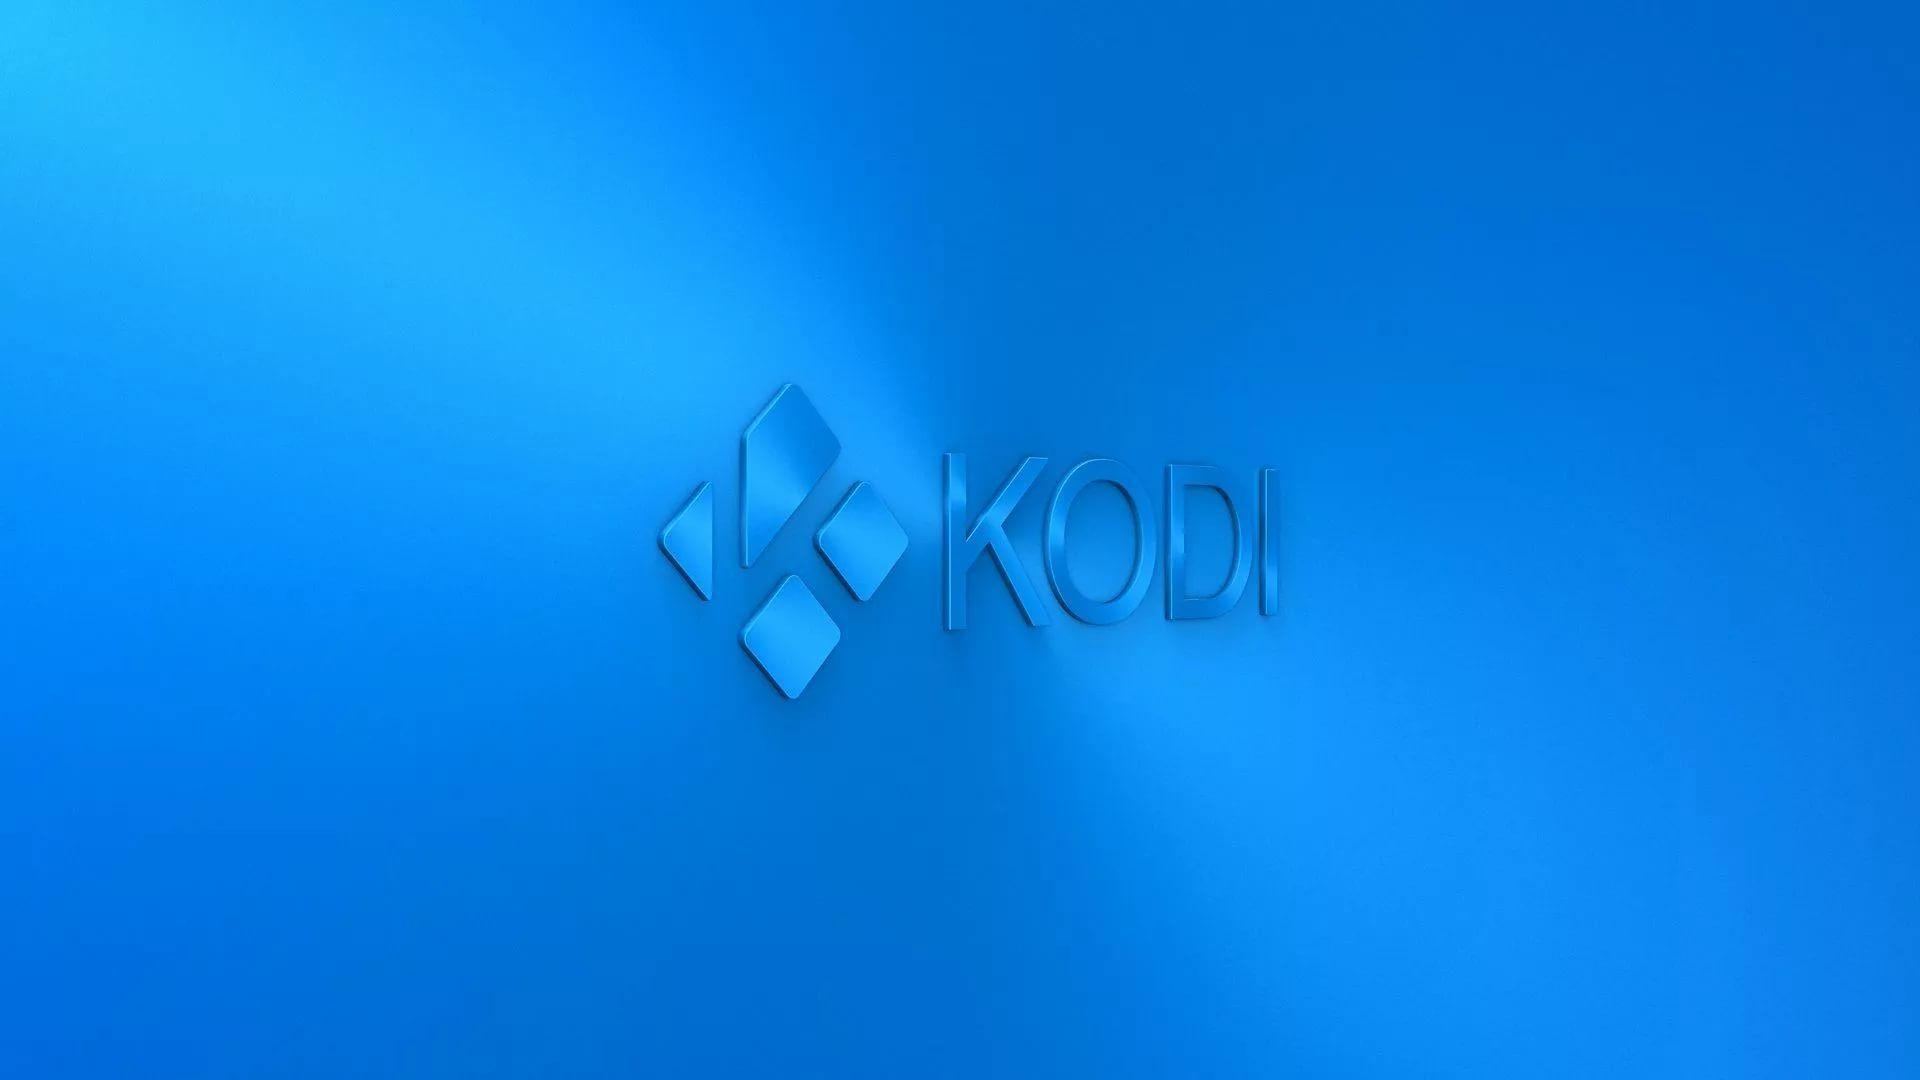 Kodi wallpaper image